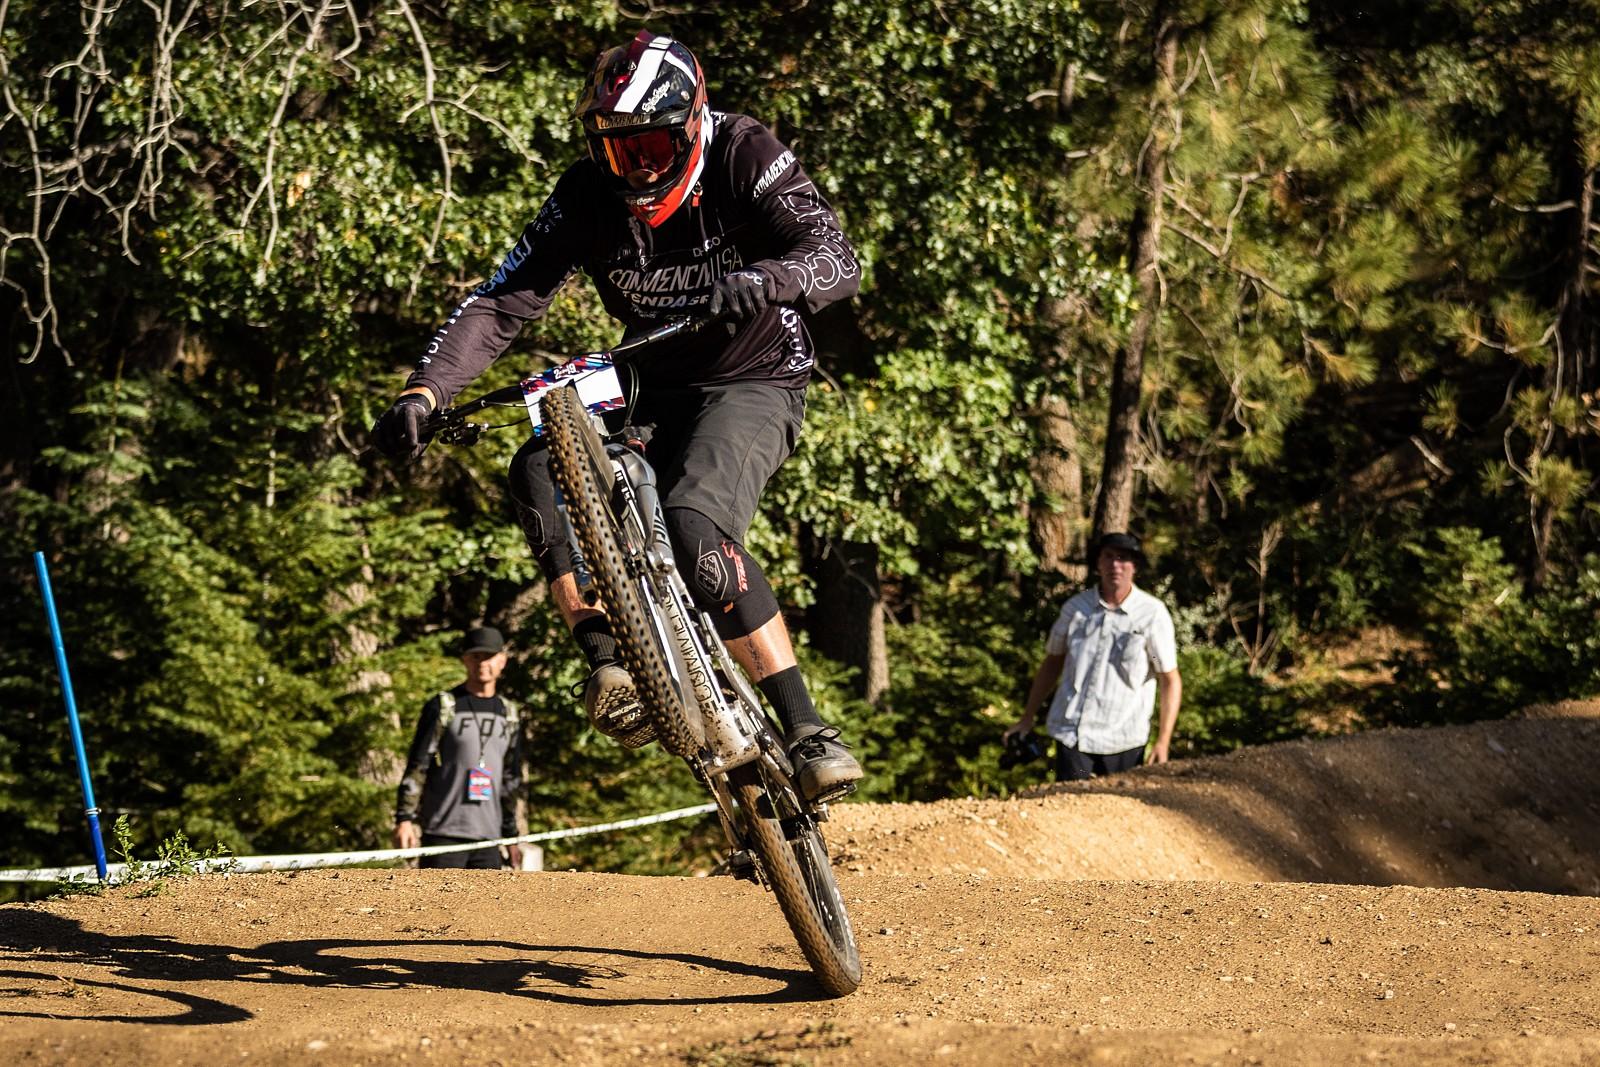 2019UsOpenSlalom-5 - ALeedomPhotography - Mountain Biking Pictures - Vital MTB